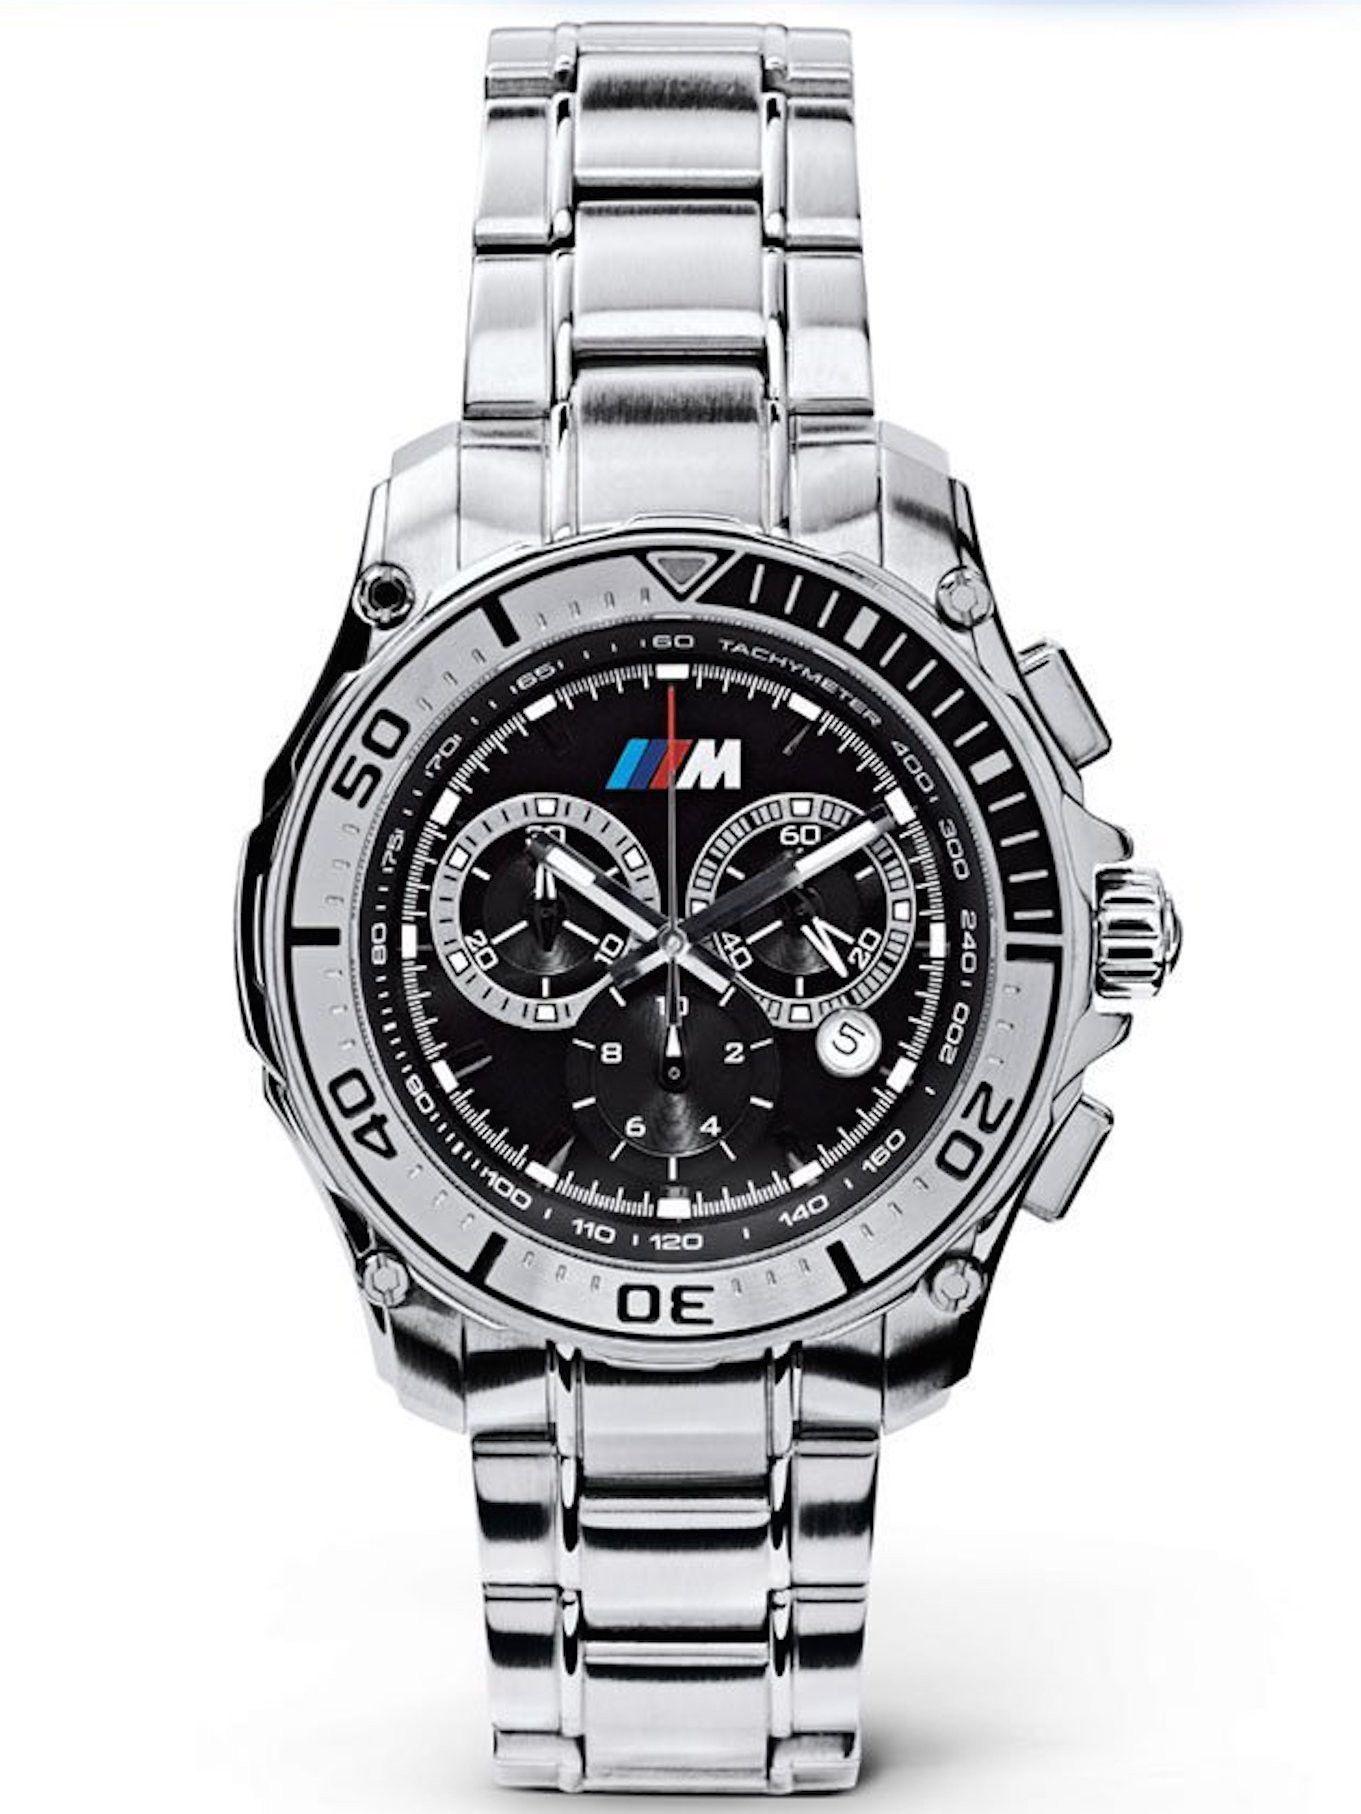 79f06b48319b BMW M Stainless Steel Chronograph Racing Watch